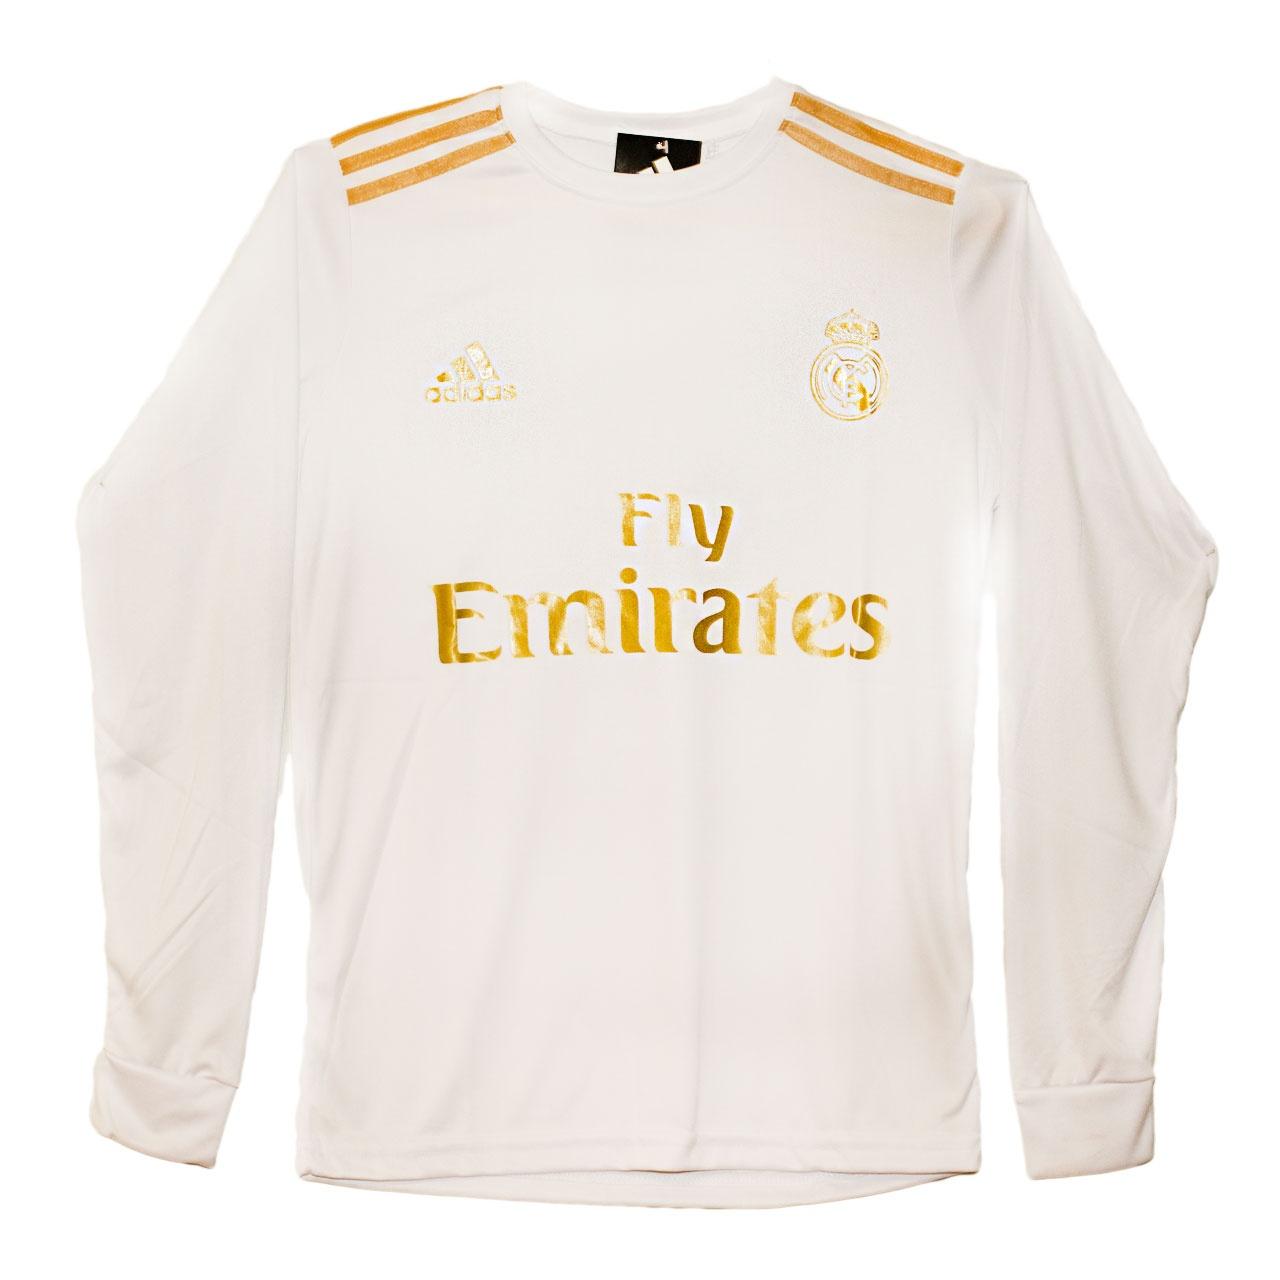 پیراهن ورزشی پسرانه طرح رئال مادرید کد 06